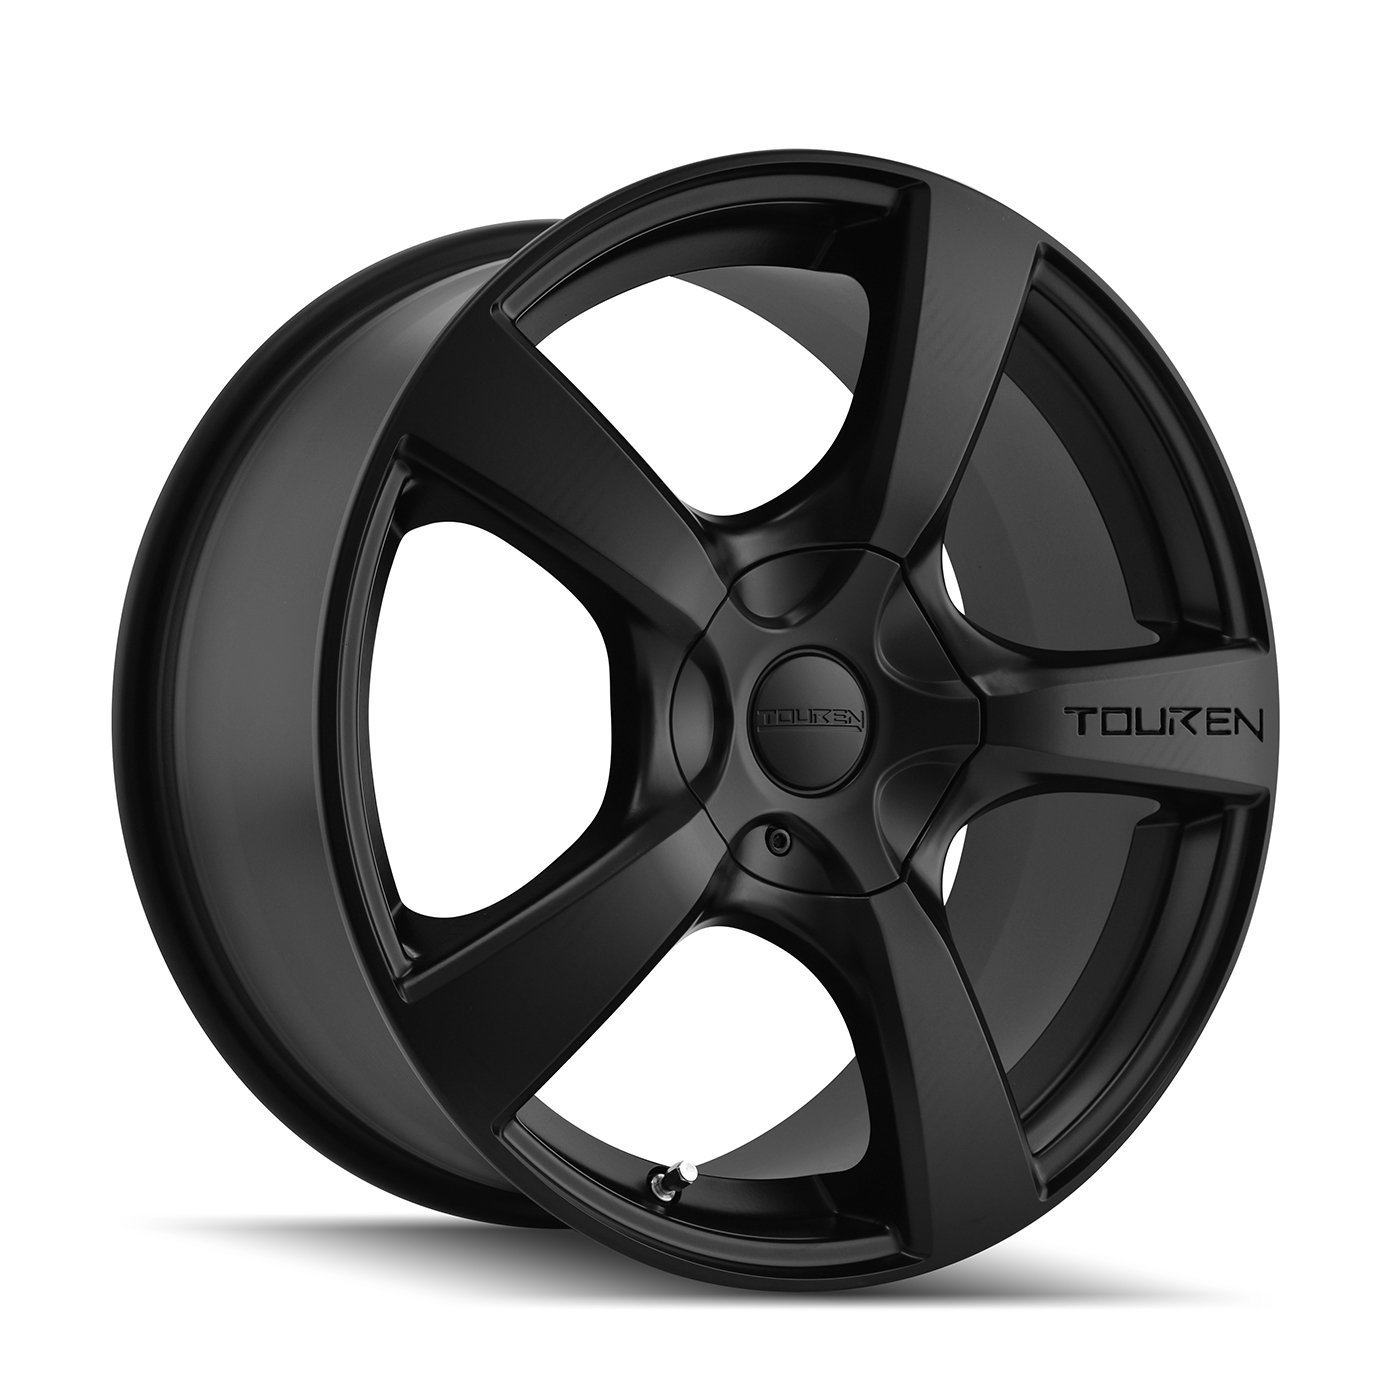 fucile cadillac dub automotive gmc strada dp chevy tires amazon rims inch fit asanti wheels com ford